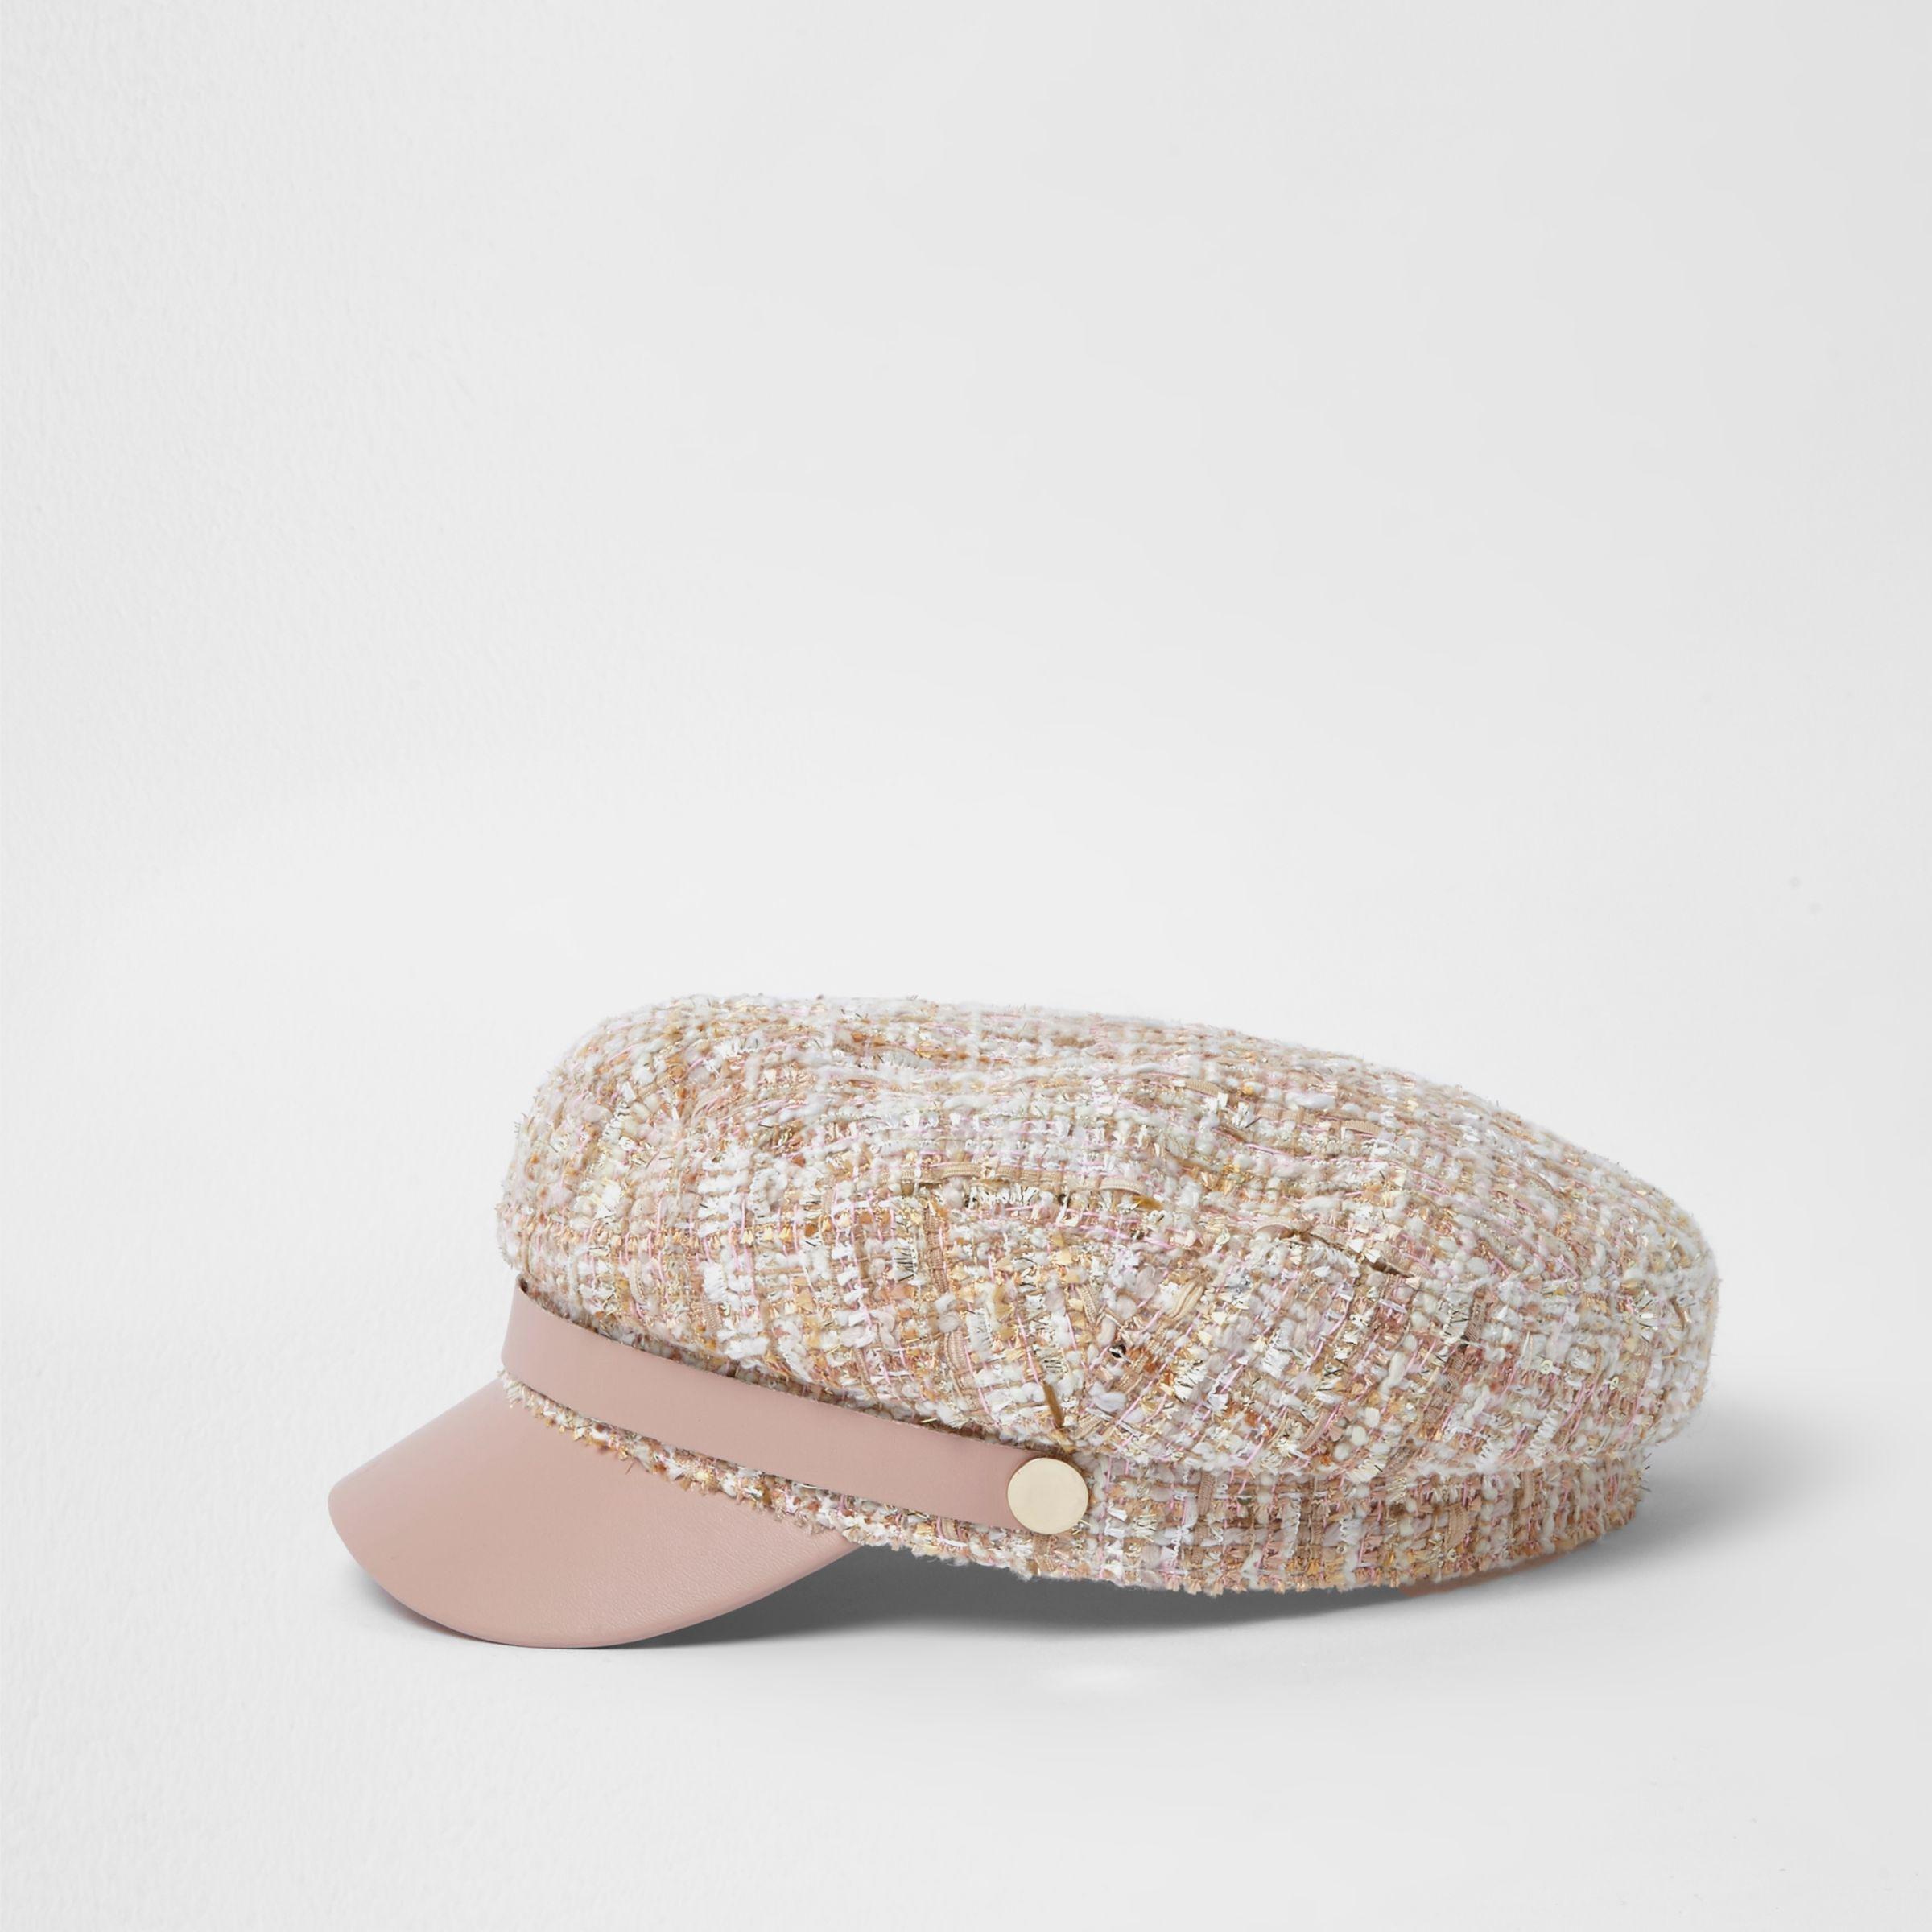 7fa386ee River Island Light Pink Boucle Knit Baker Boy Hat Light Pink Boucle ...